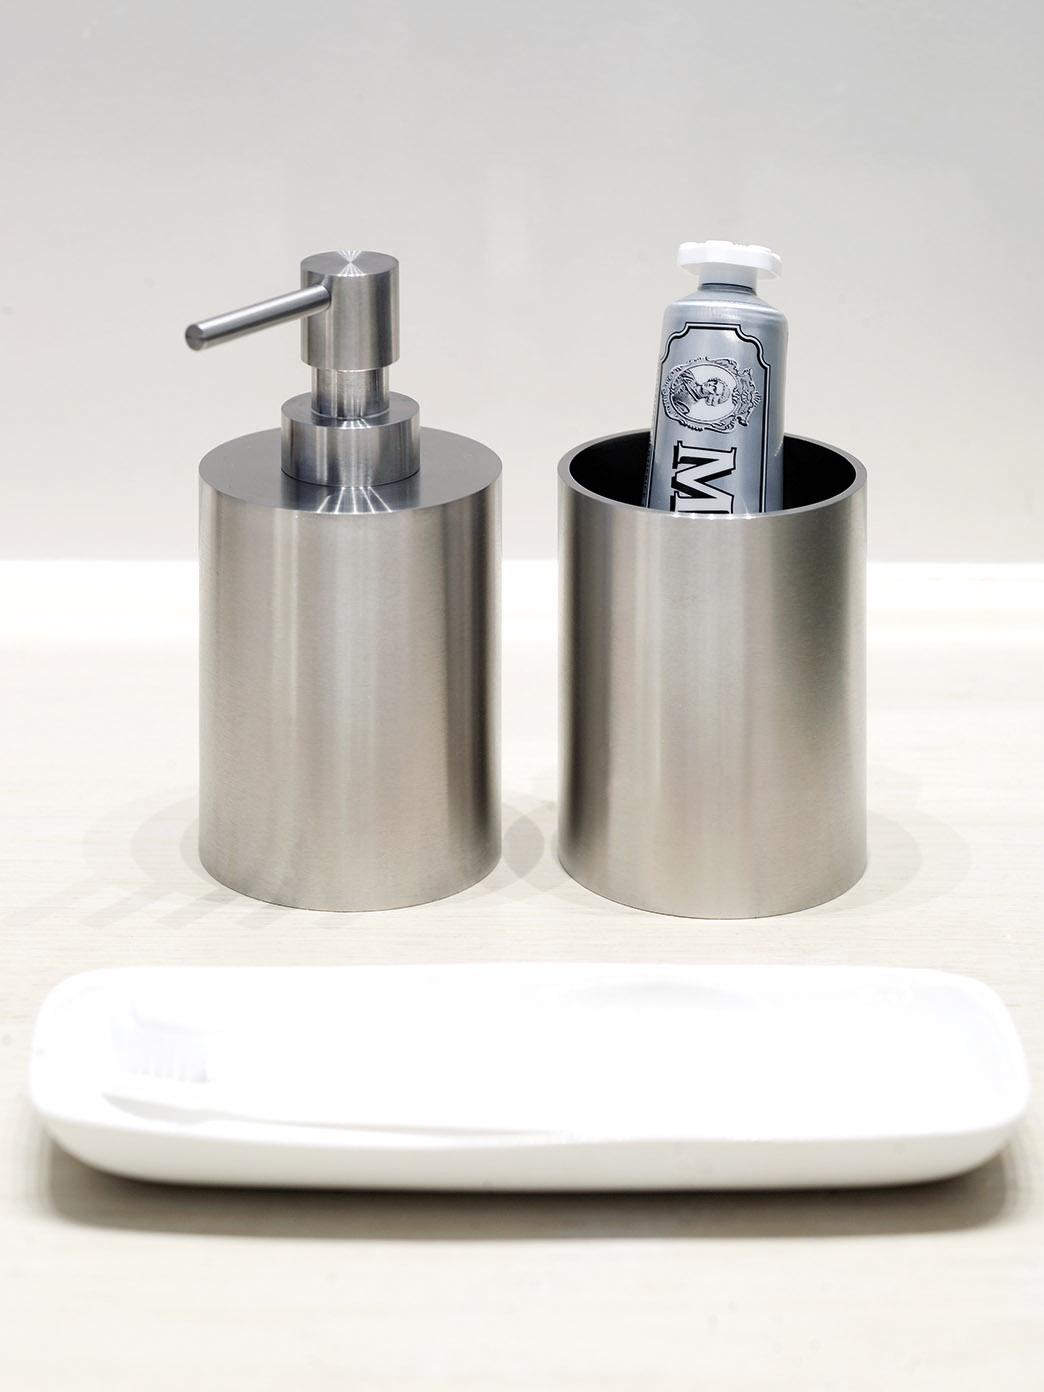 Bathware by Formani